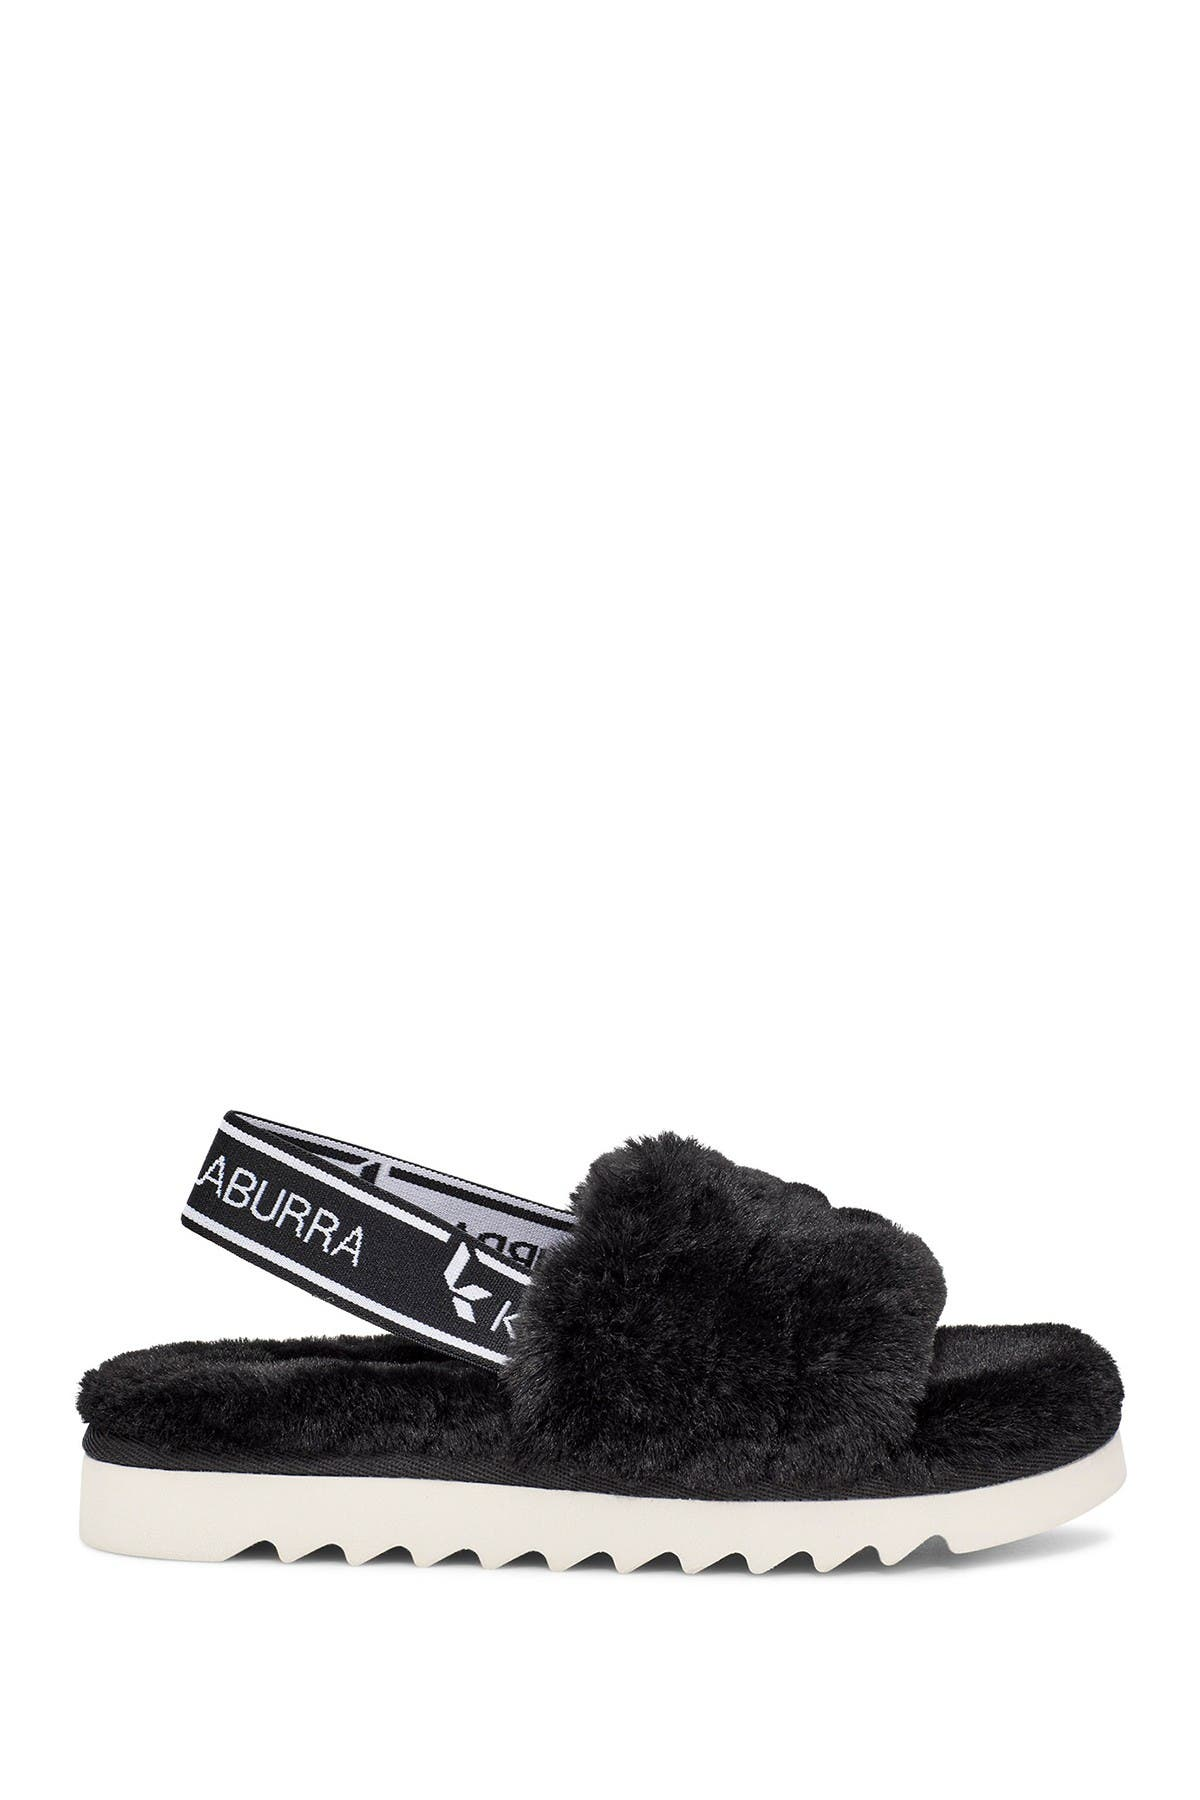 KOOLABURRA BY UGG Fuzz'n Faux Fur Slipper Sandal